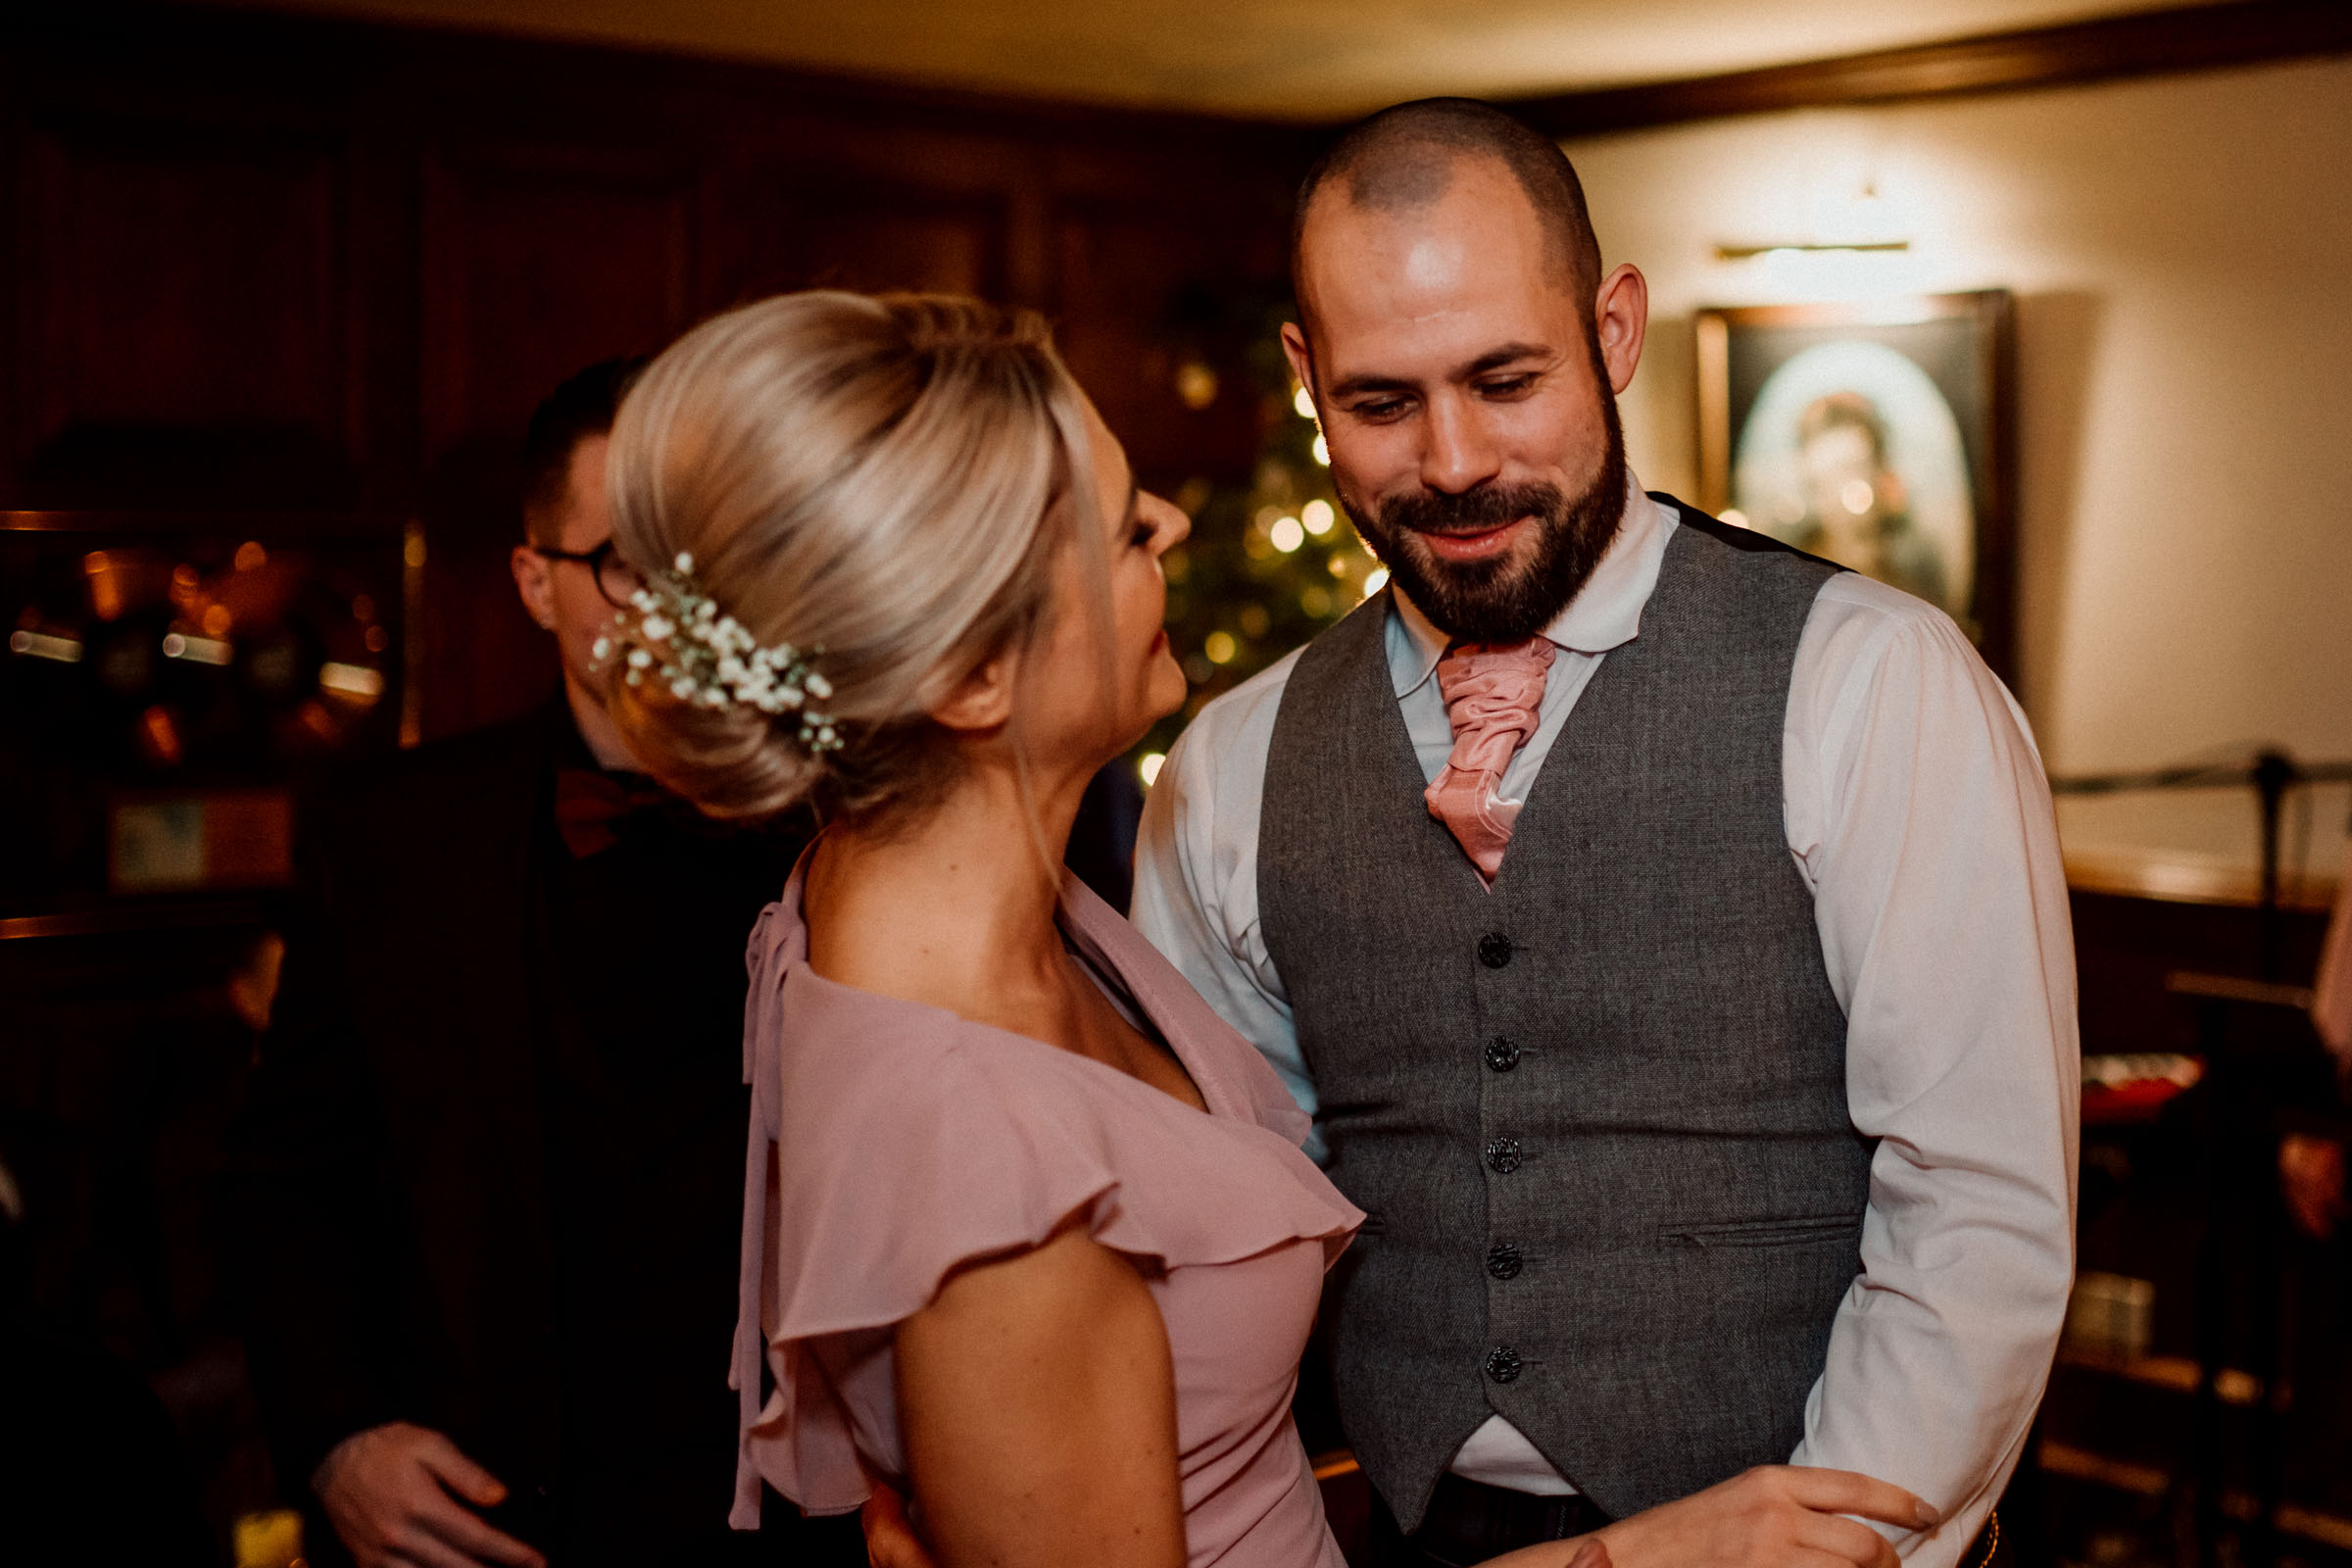 Oran-Mor-Wedding-Photographer-DearlyPhotography (48 of 55).jpg